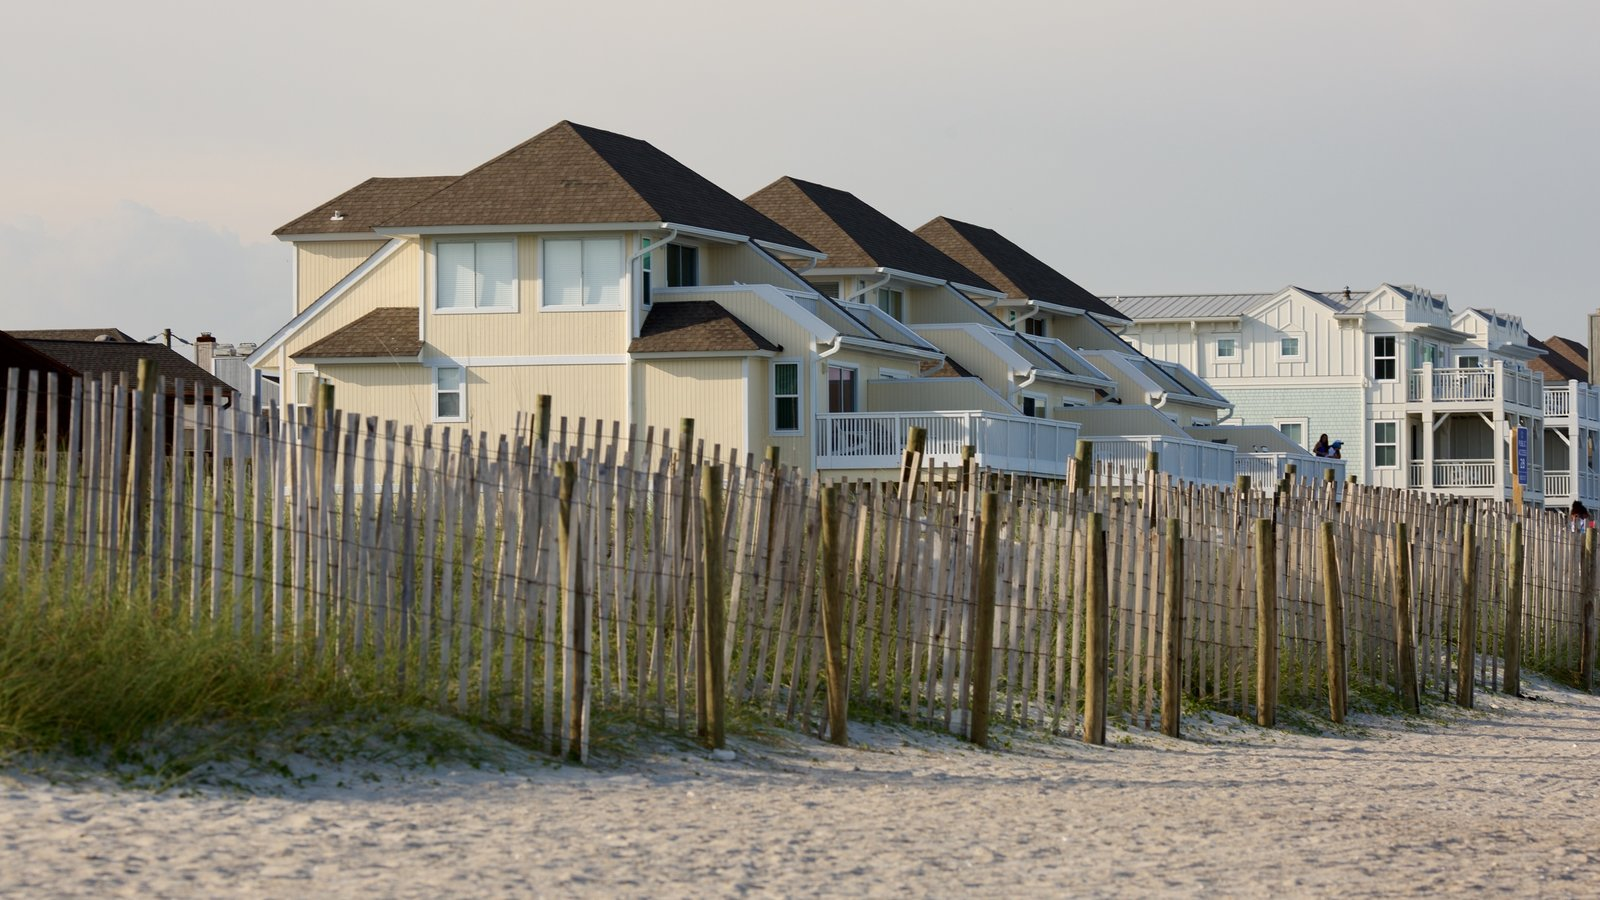 Wrightsville Beach featuring general coastal views, a house and a sandy beach